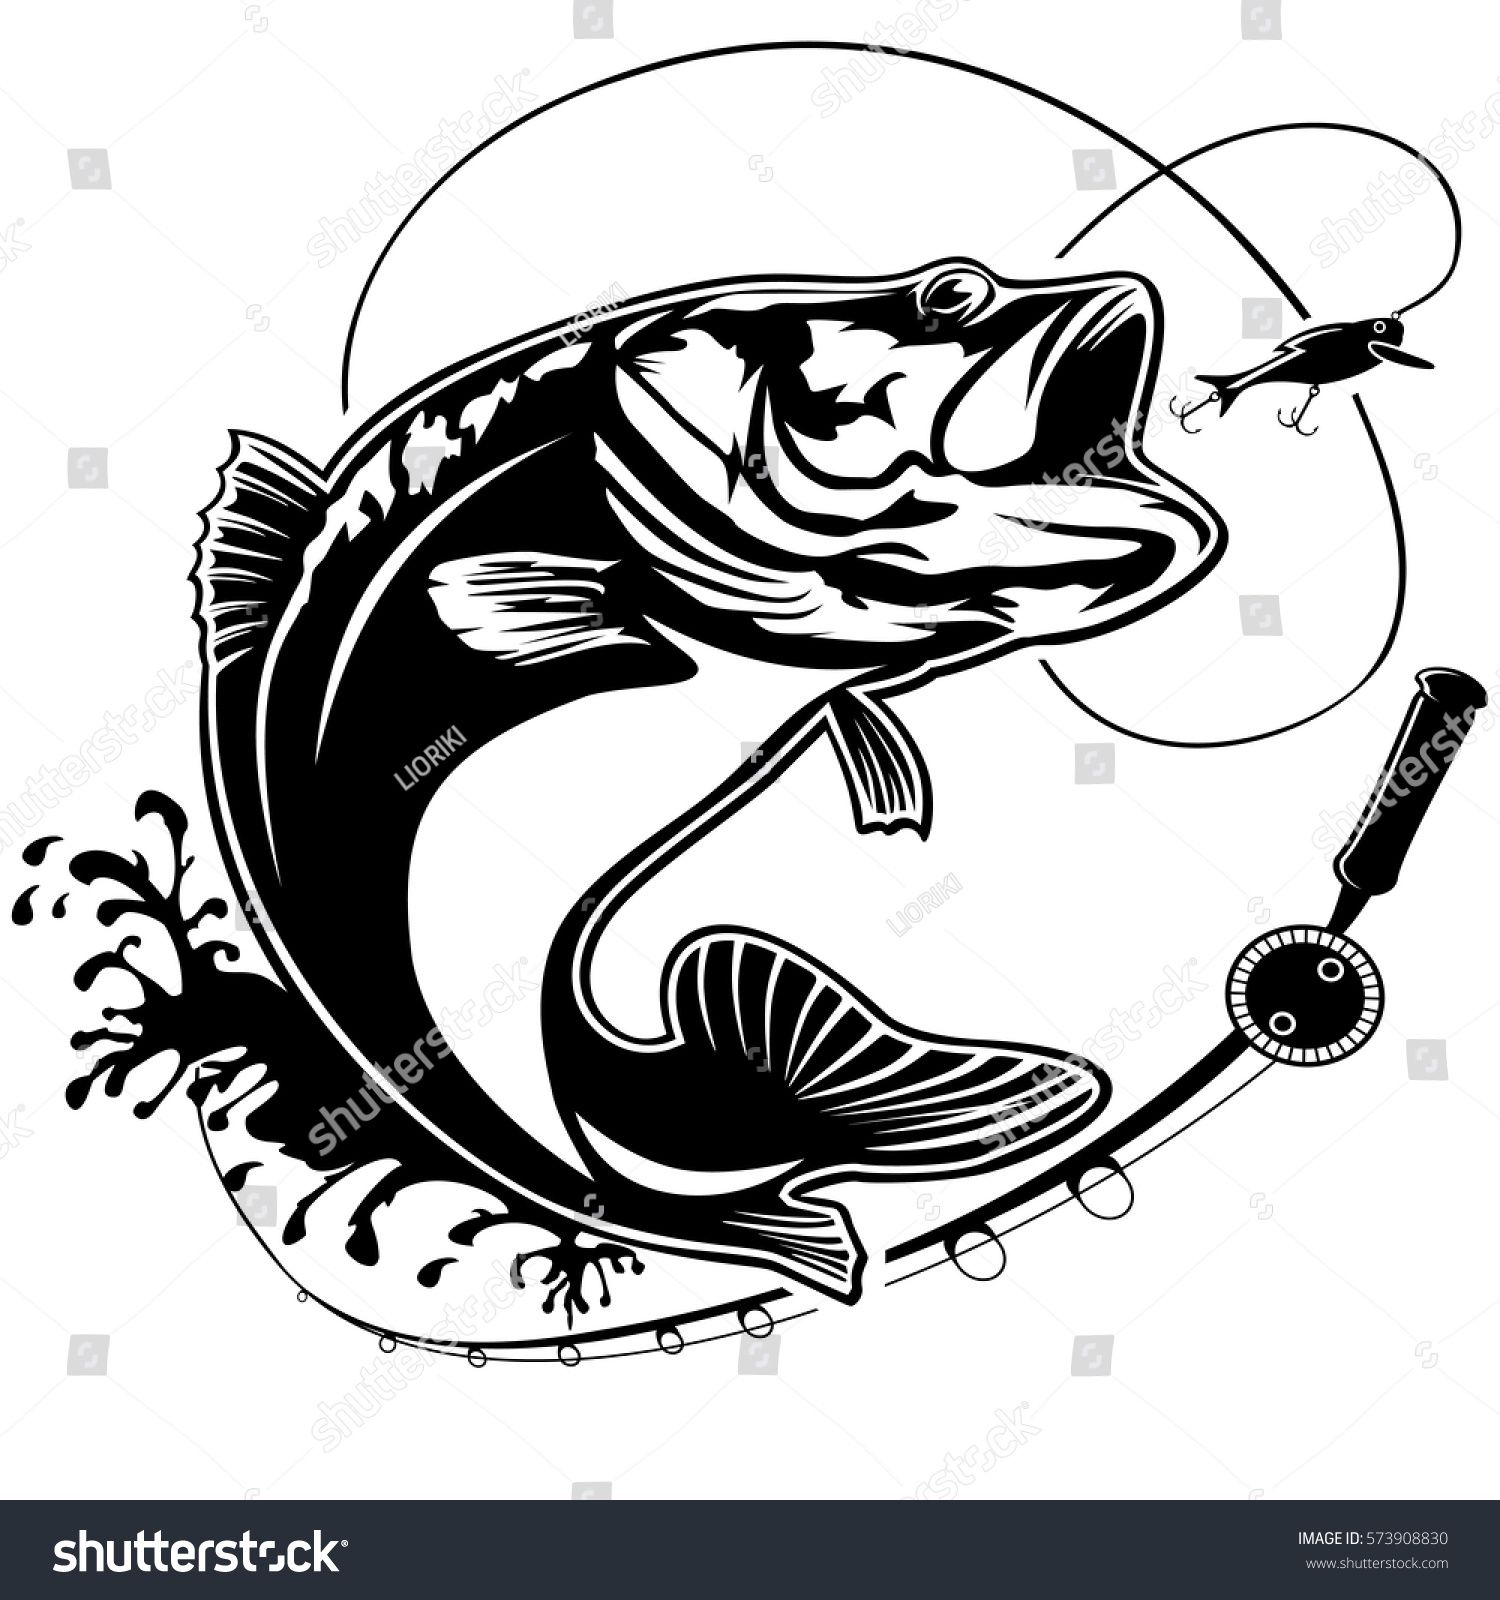 Fishing logo. Bass fish club emblem. Fishing theme vector.